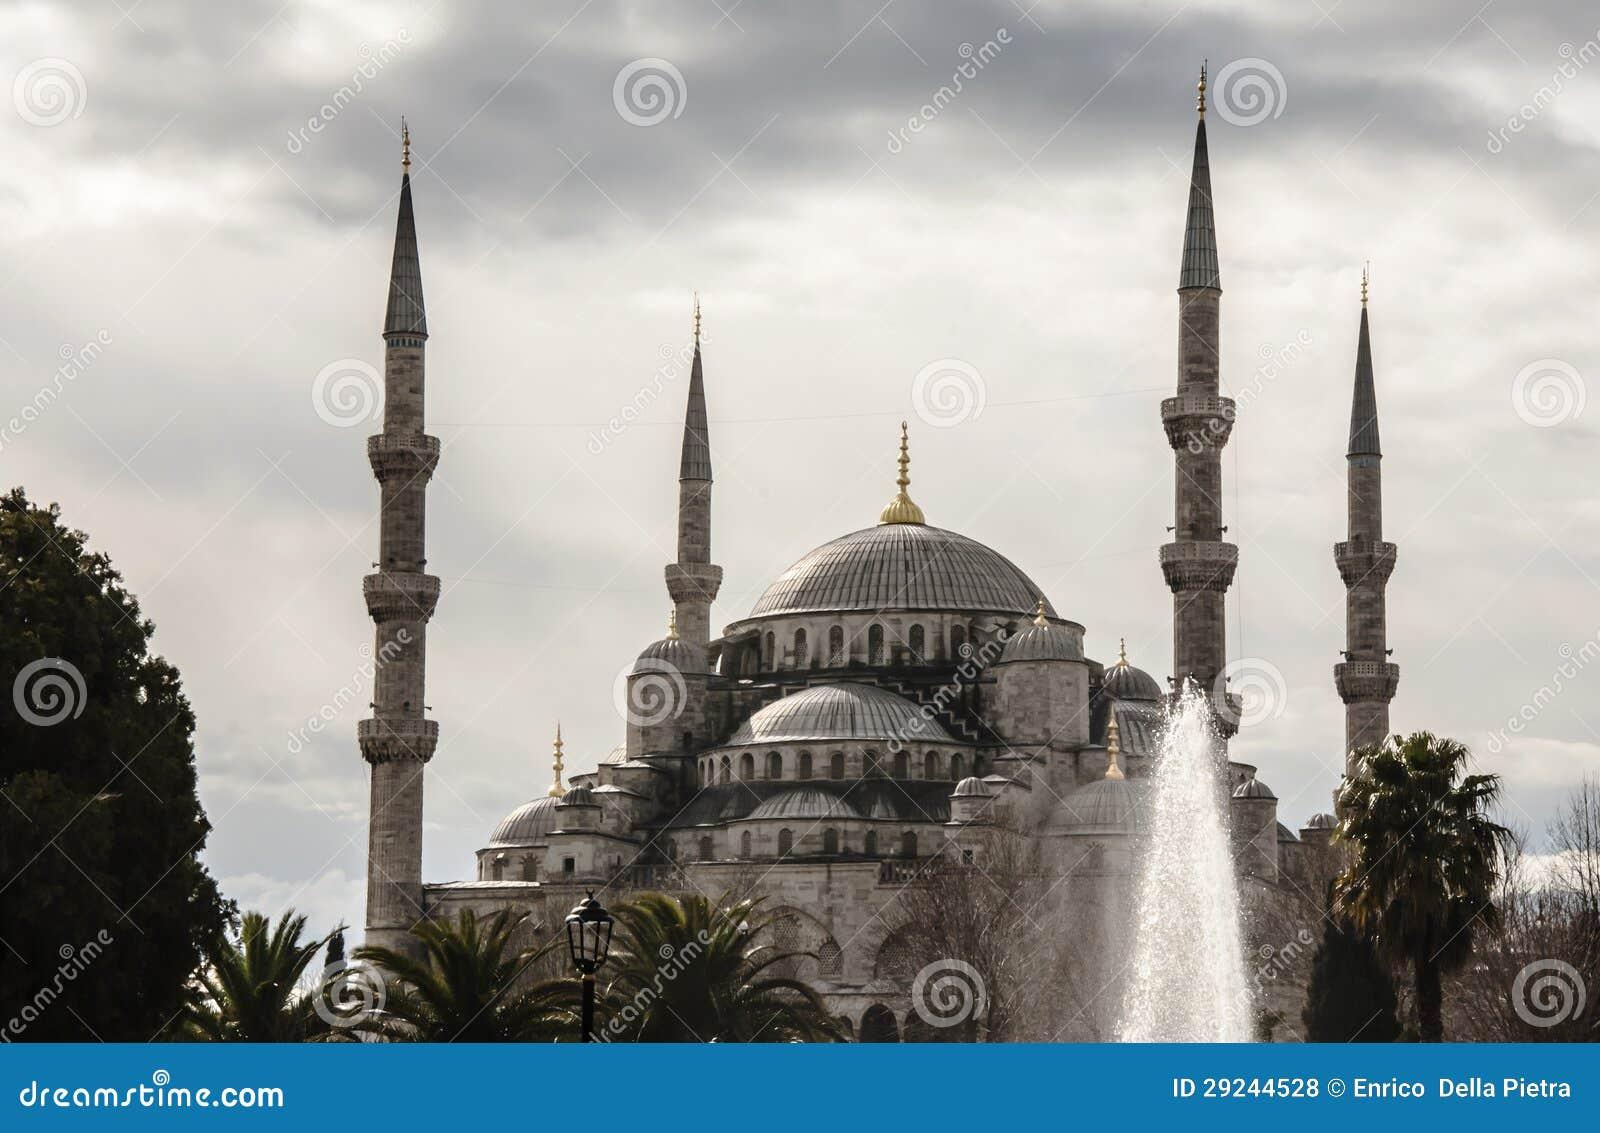 Download Sultanahmed foto de stock. Imagem de arquitetura, istambul - 29244528